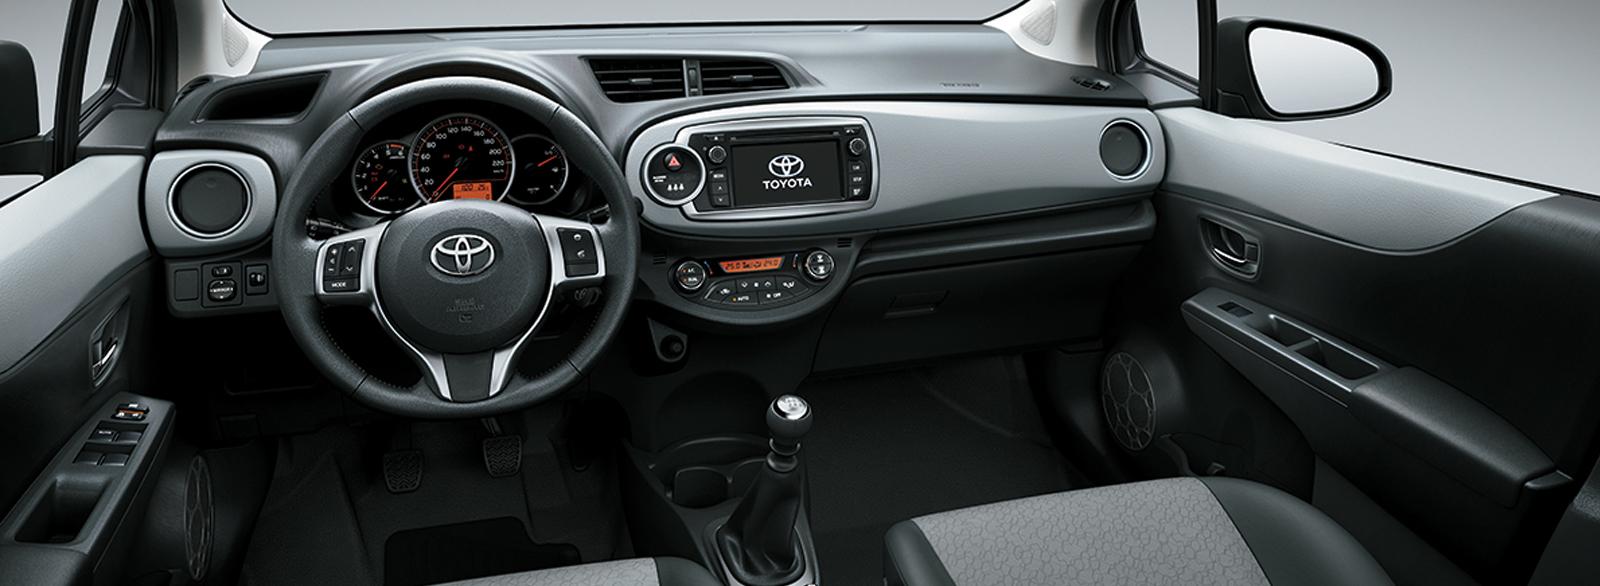 yaris-HB-interior-img_1